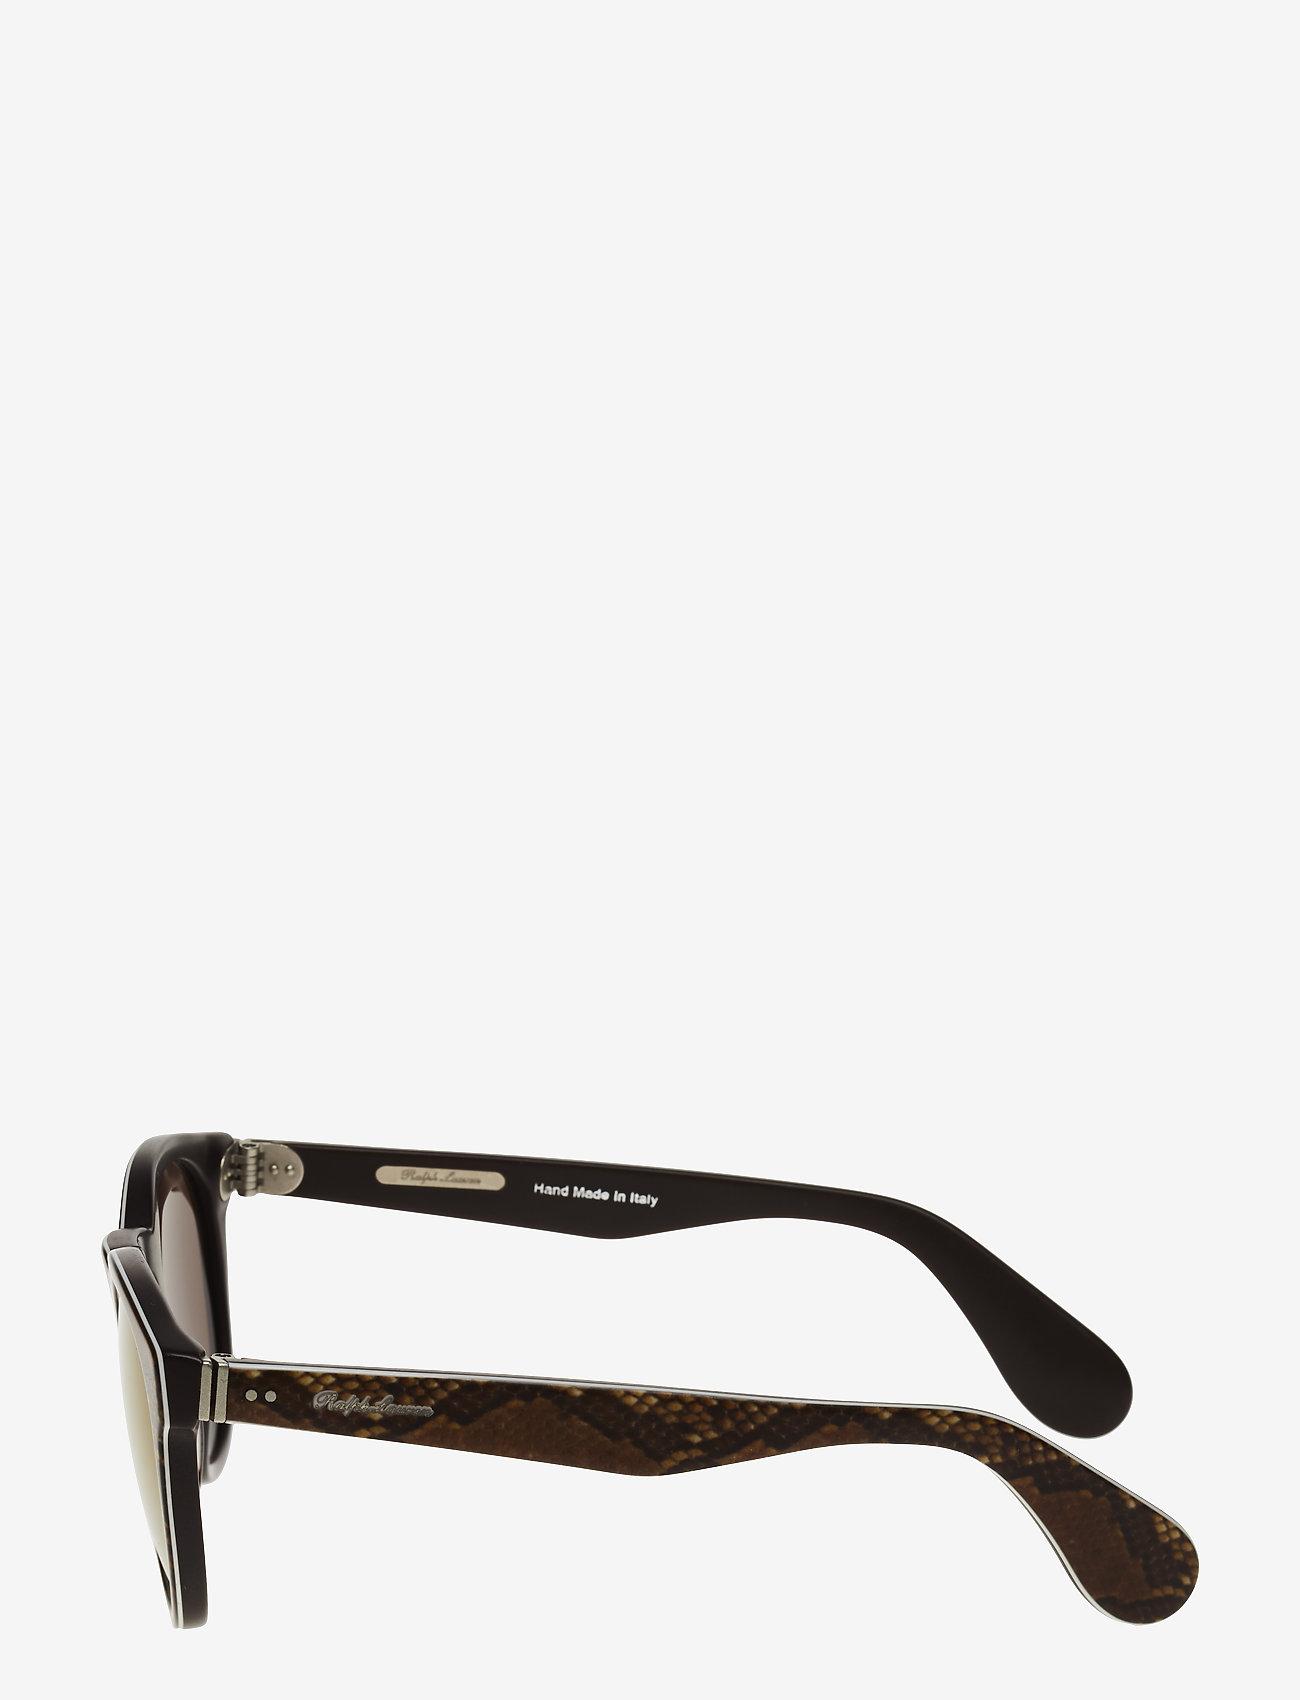 Ralph Ralph Lauren Sunglasses HERITAGE - Okulary przeciwsłoneczne TOP PYTHON ON BROWN VINTAGE - Akcesoria